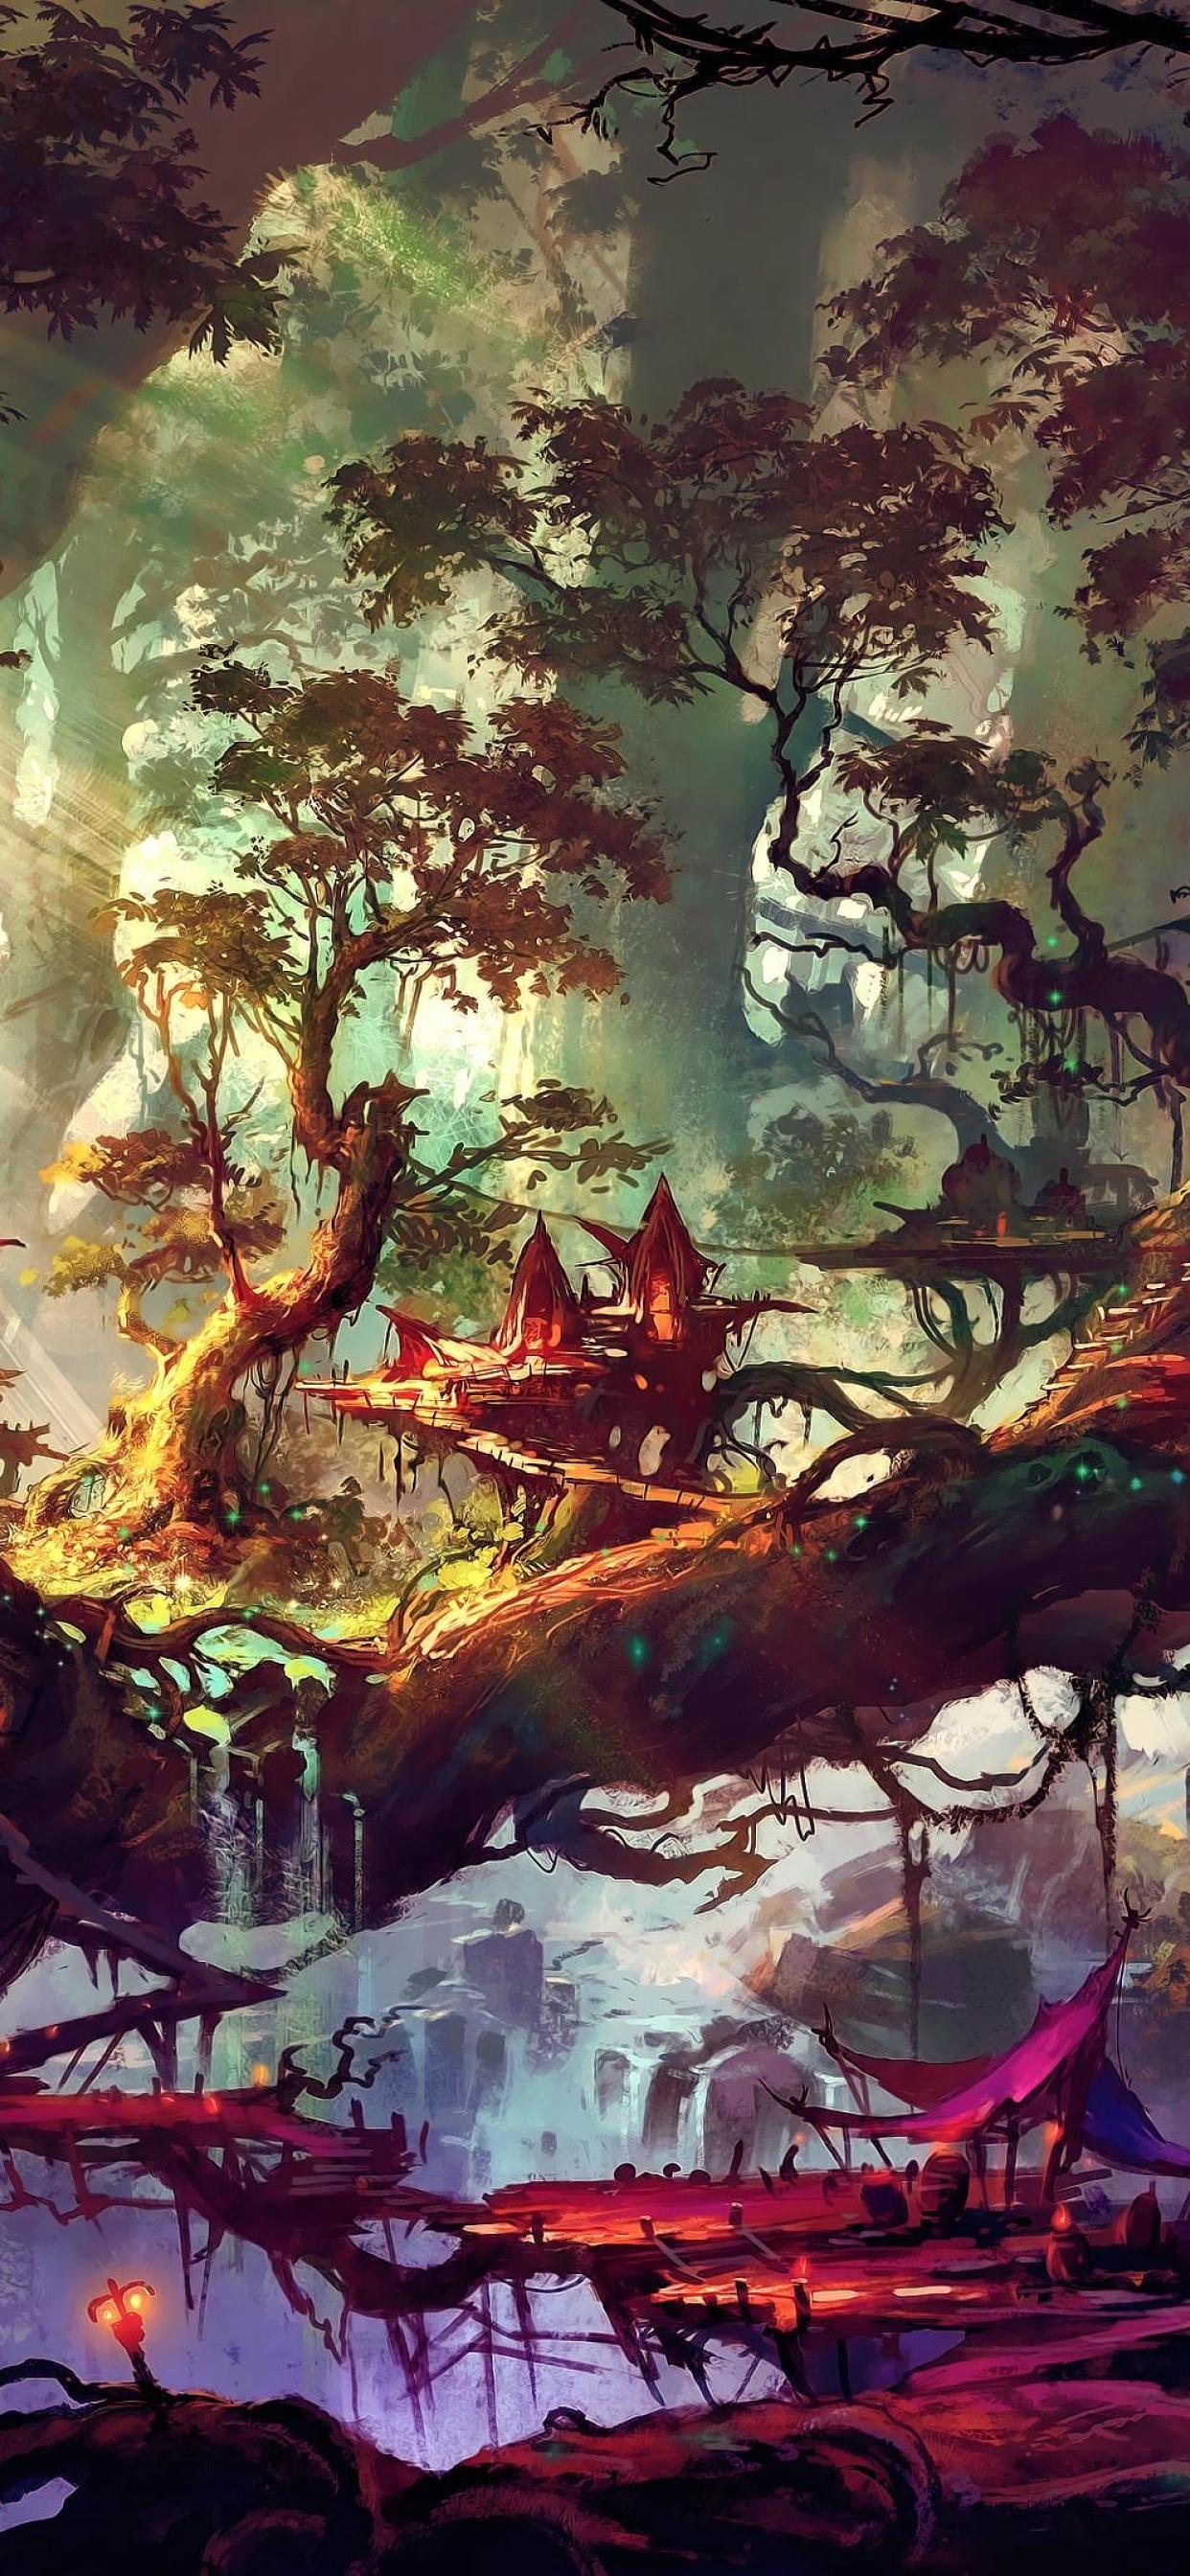 Elven Forest Wallpaper in 1242x2688 Resolution